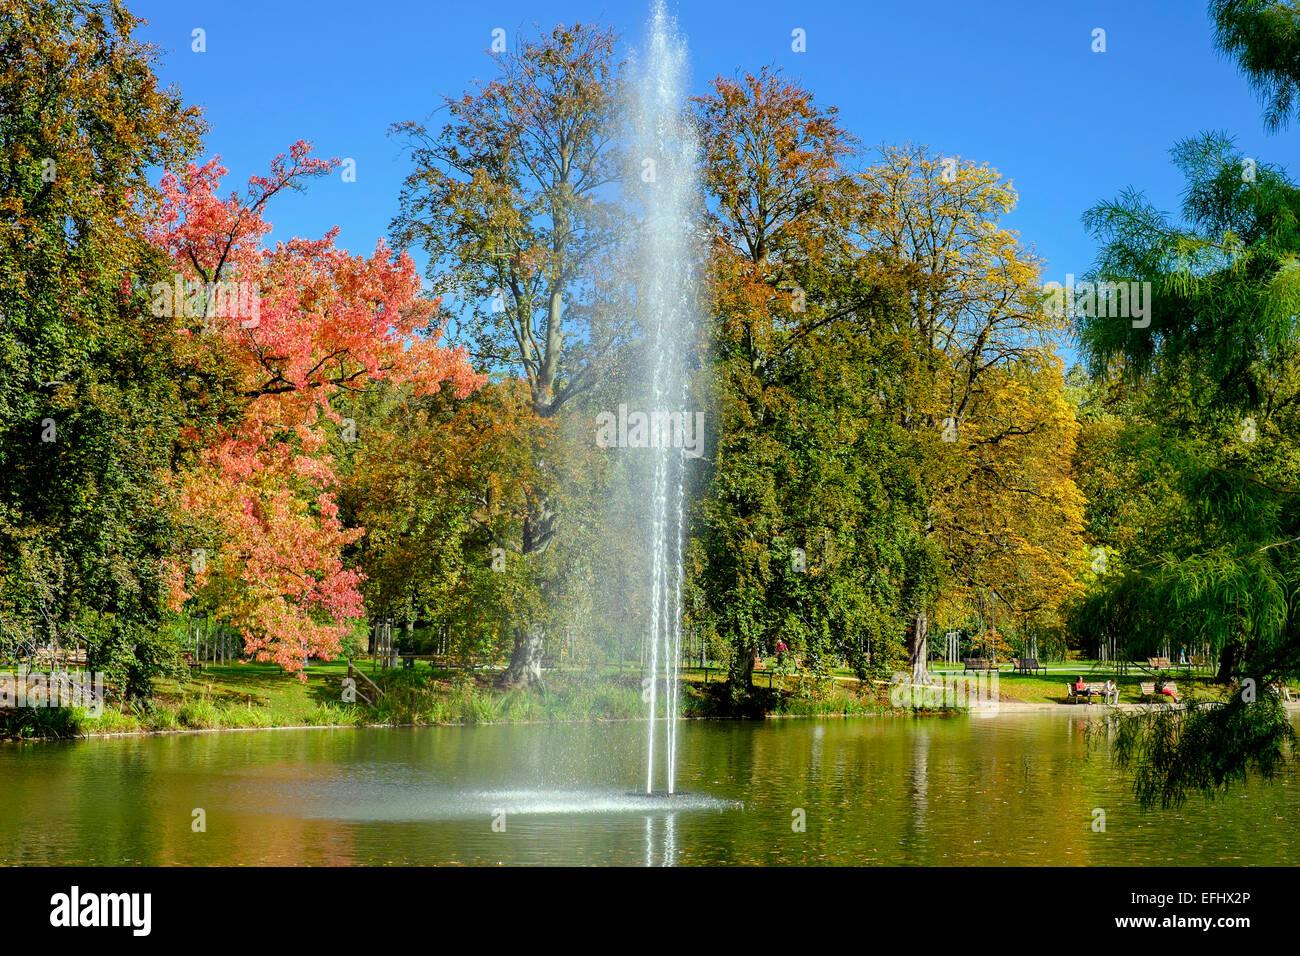 Water jet and pond Parc de l'Orangerie park Strasbourg Alsace France - Stock Image